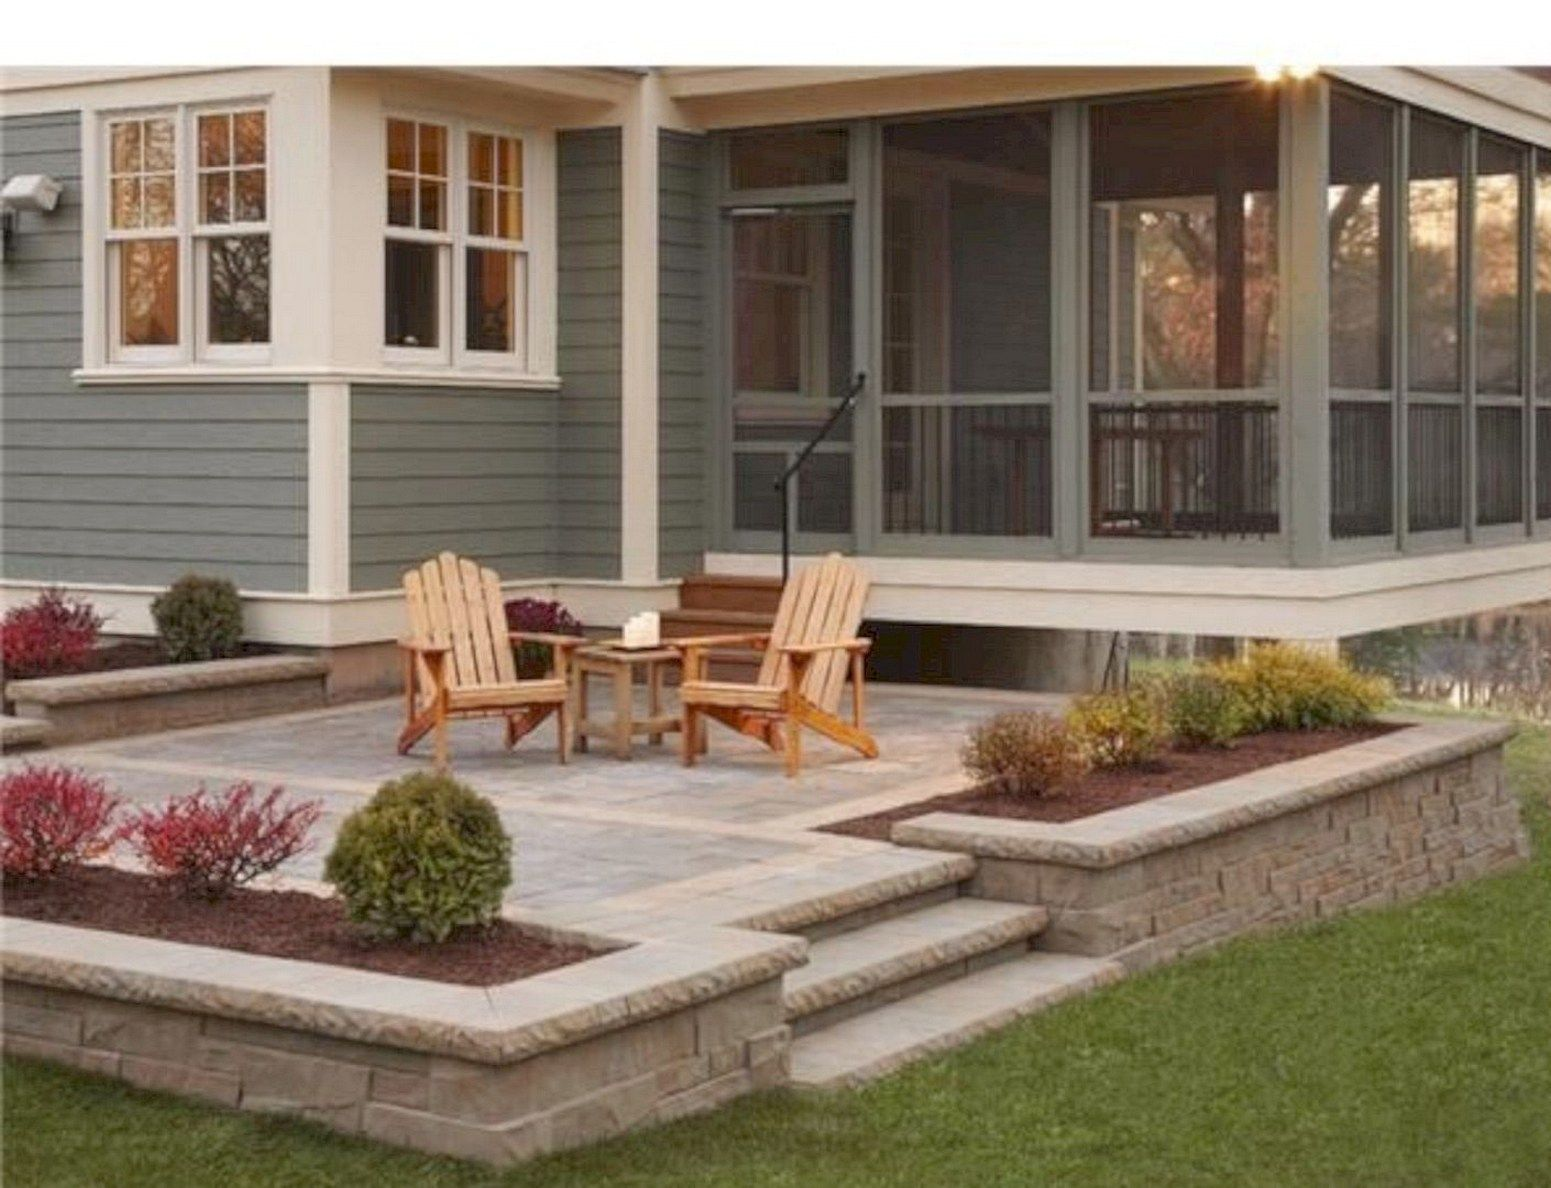 80 Farmhouse Backyard Deck Design Ideas Remodels 13